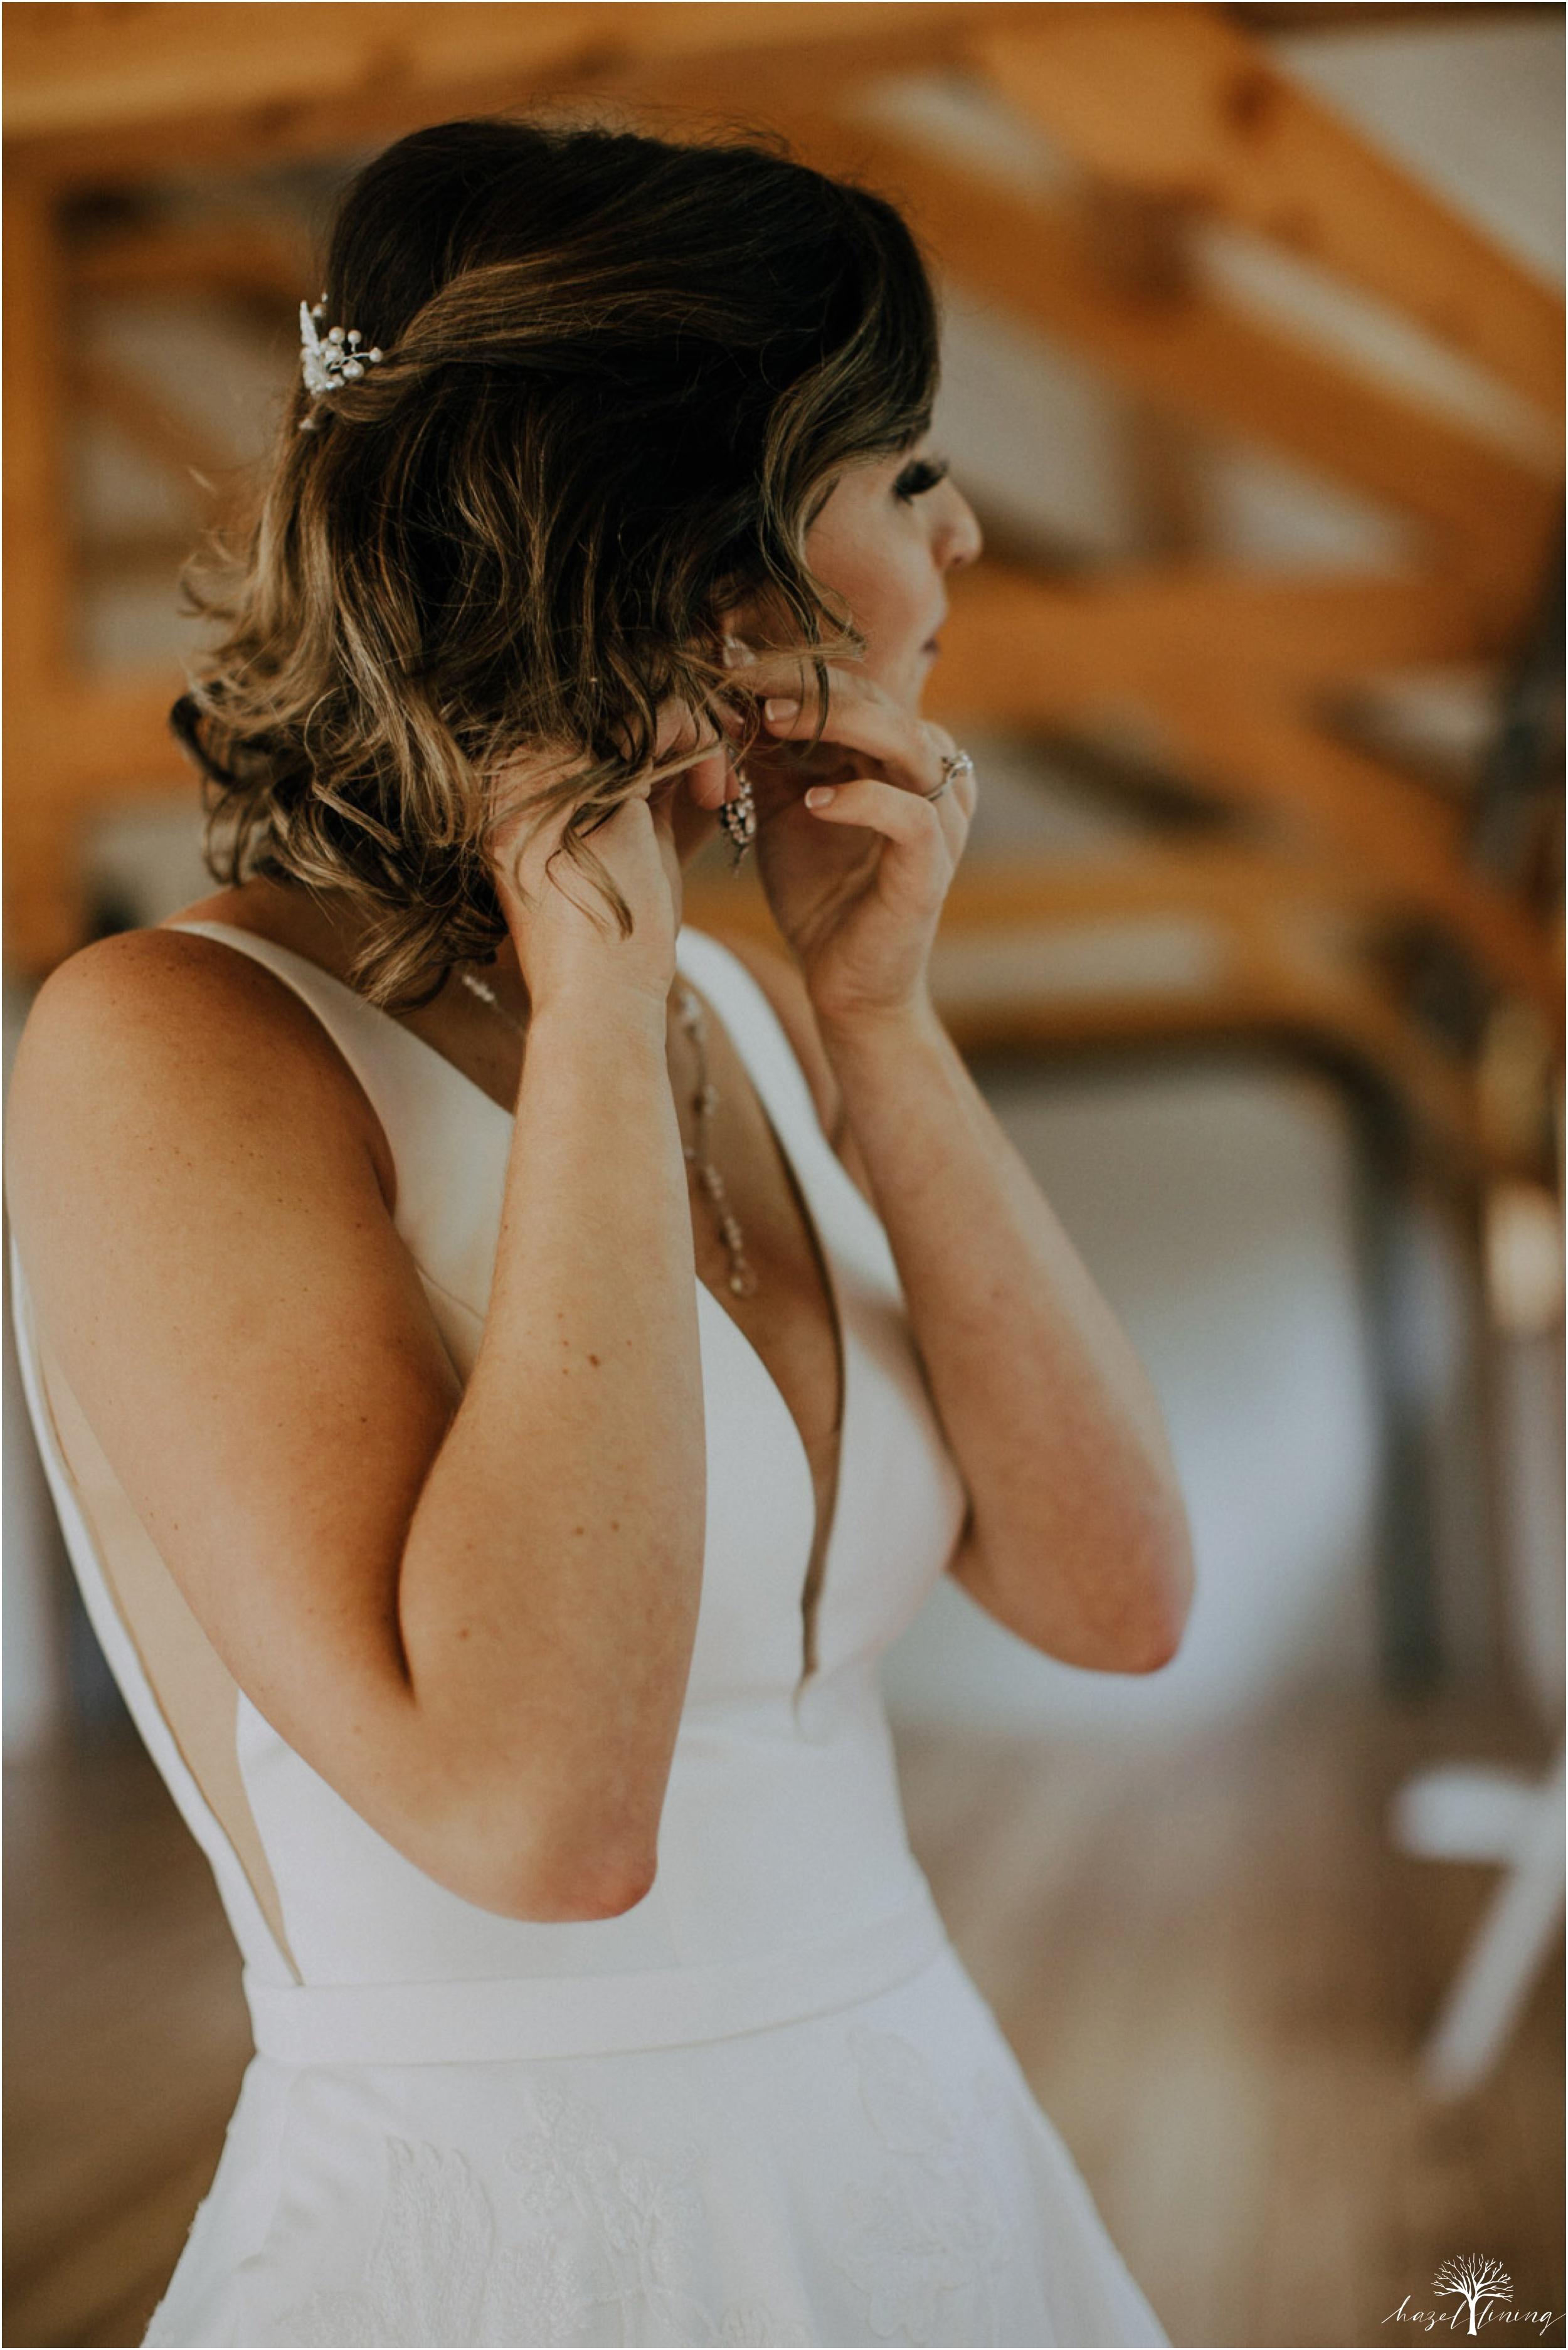 maureen-hepner-anthony-giordano-rose-bank-winery-newtow-pennsylvania-luxury-summer-wedding-hazel-lining-photography-destination-elopement-wedding-engagement-photography_0018.jpg